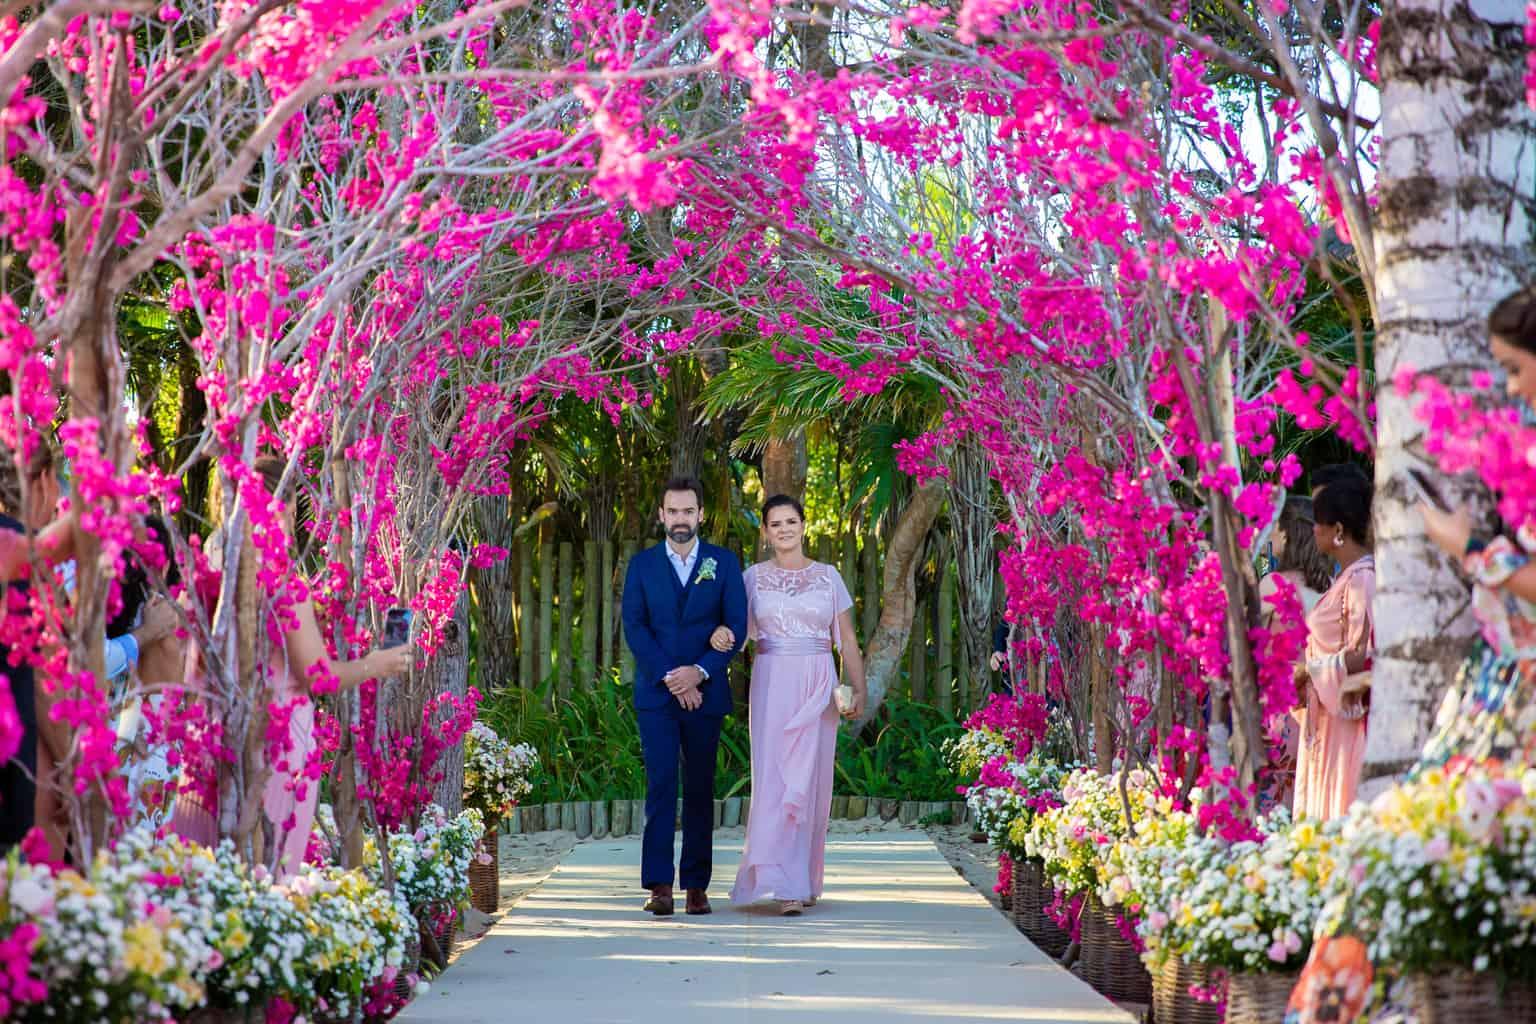 casamento-Taina-e-Hugo-Itapororoca-Villa-Trancoso-Patricia-Galvao-Sotter-Fotografia-Cerimonia-na-praia453